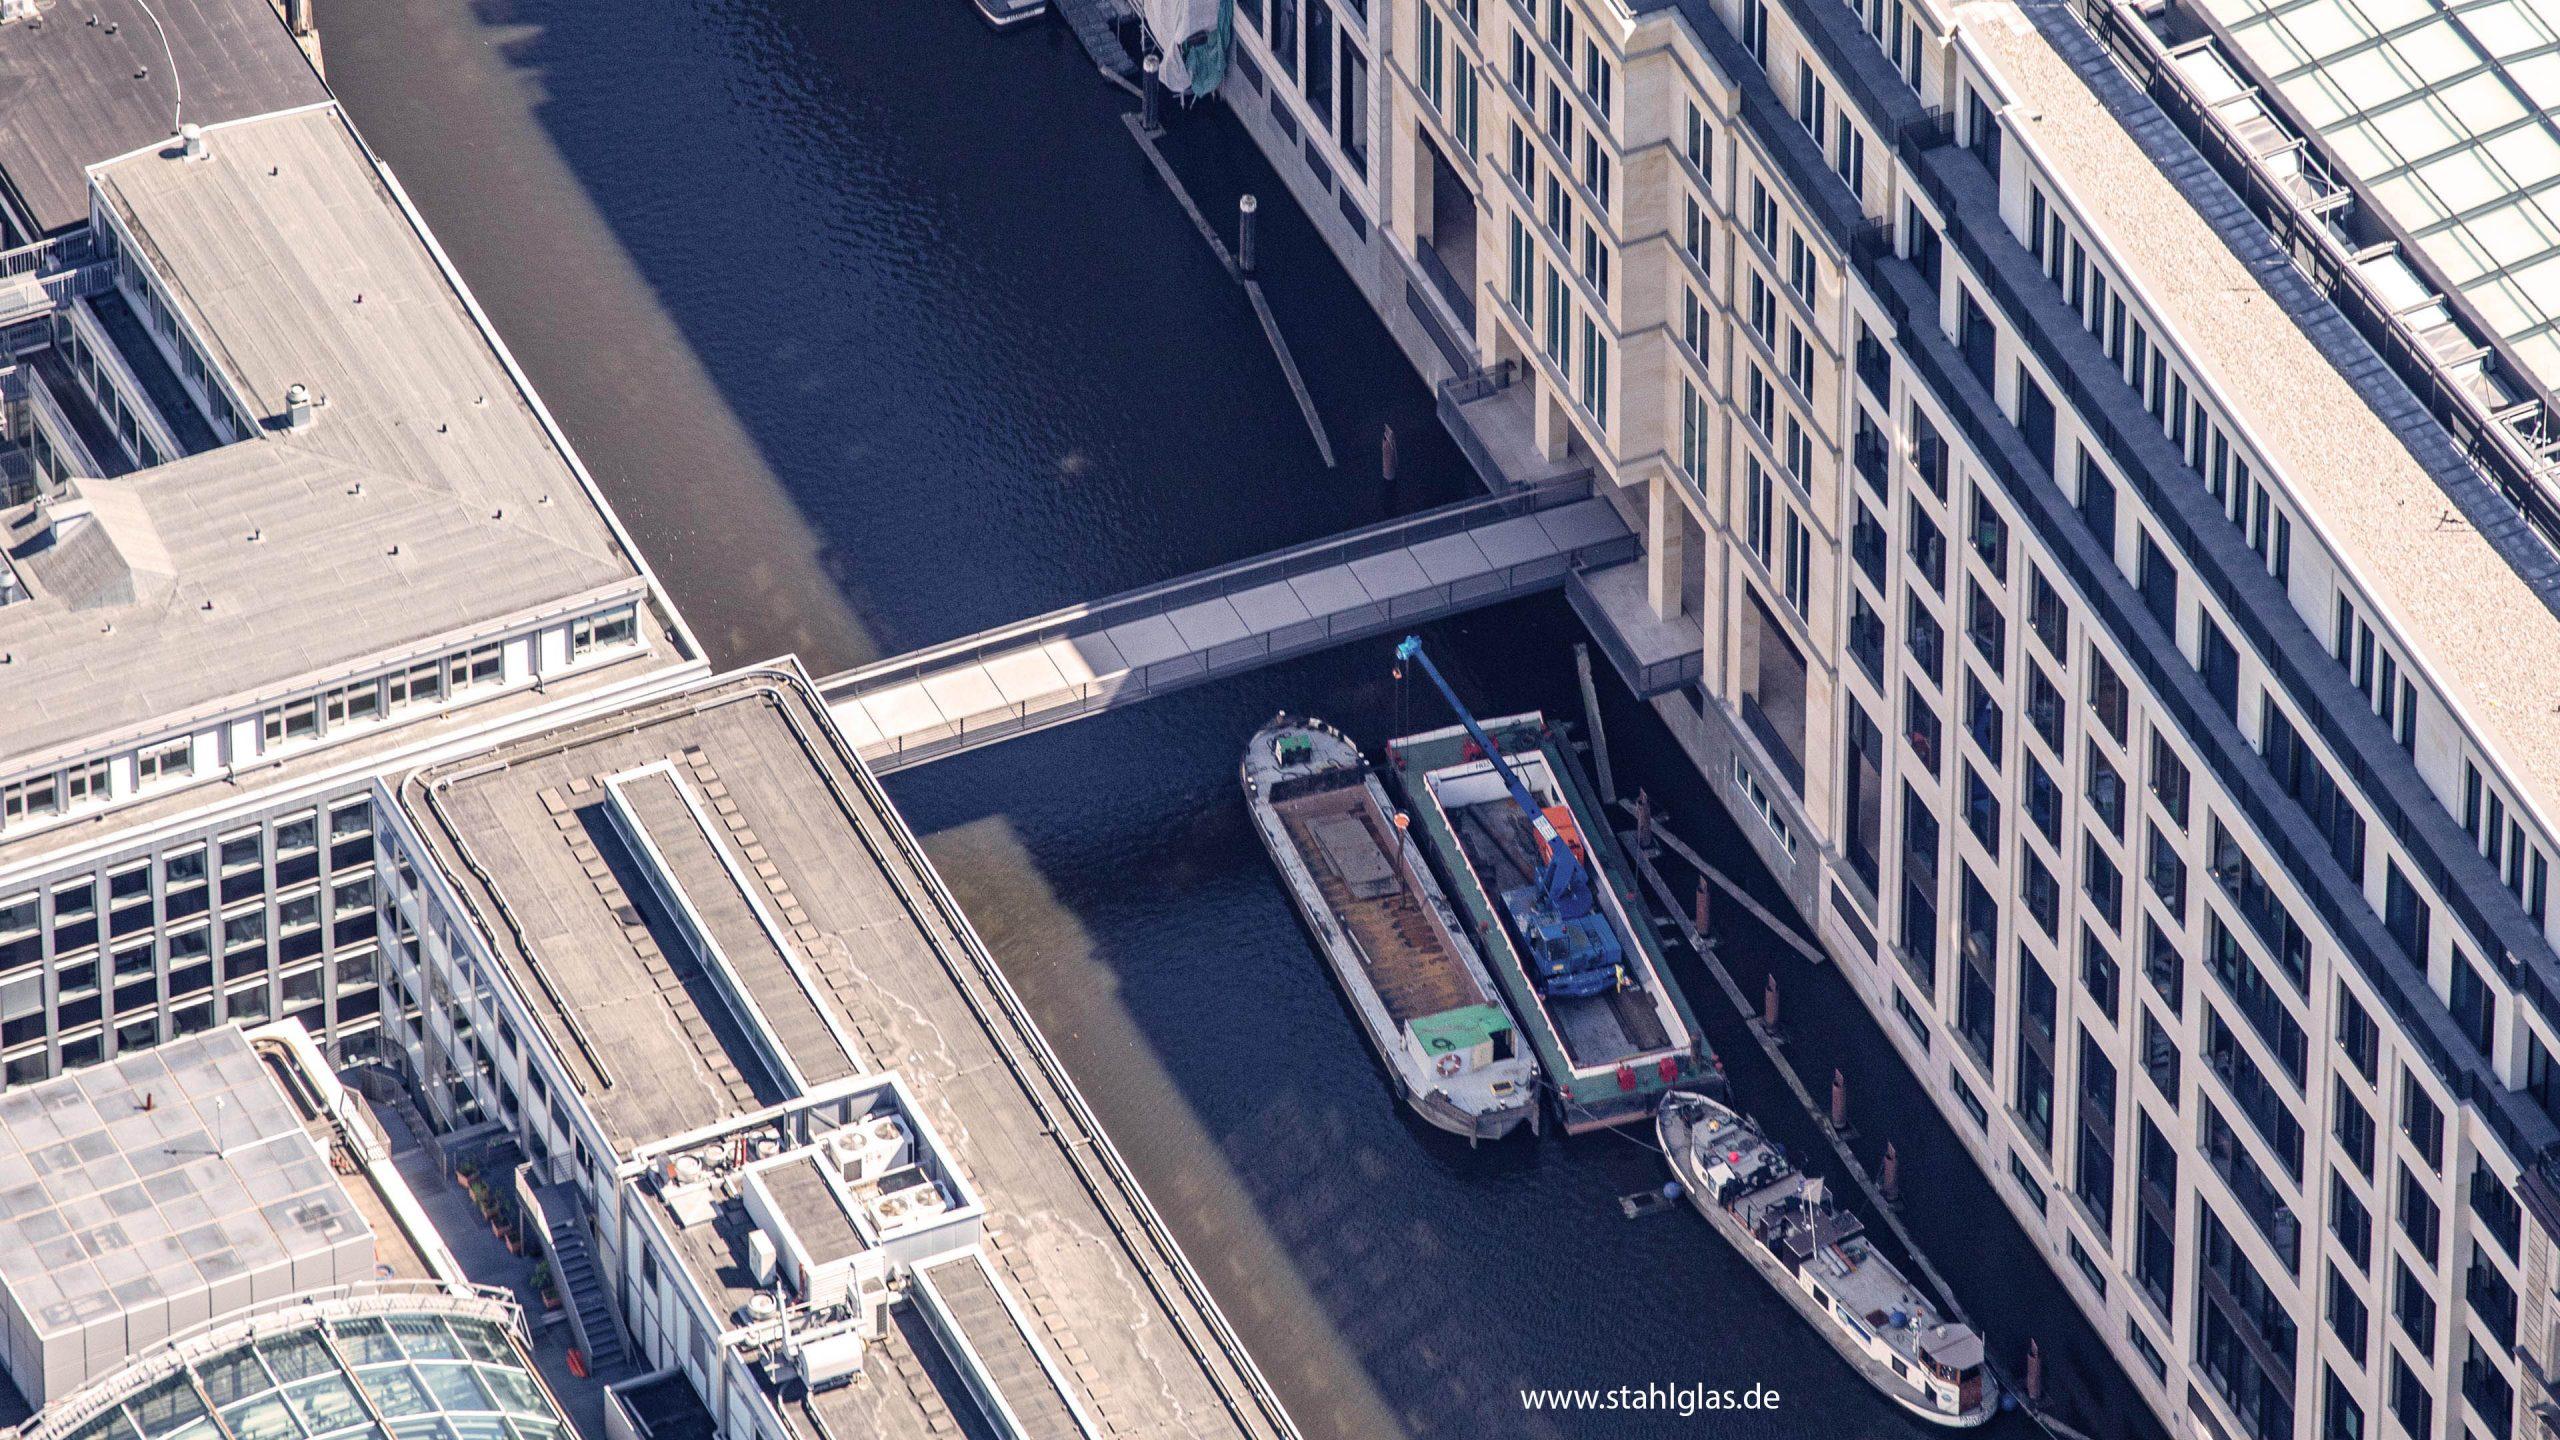 Luftaufnahme der Fußgängerbrücke Wallstegbrücke in Hamburg